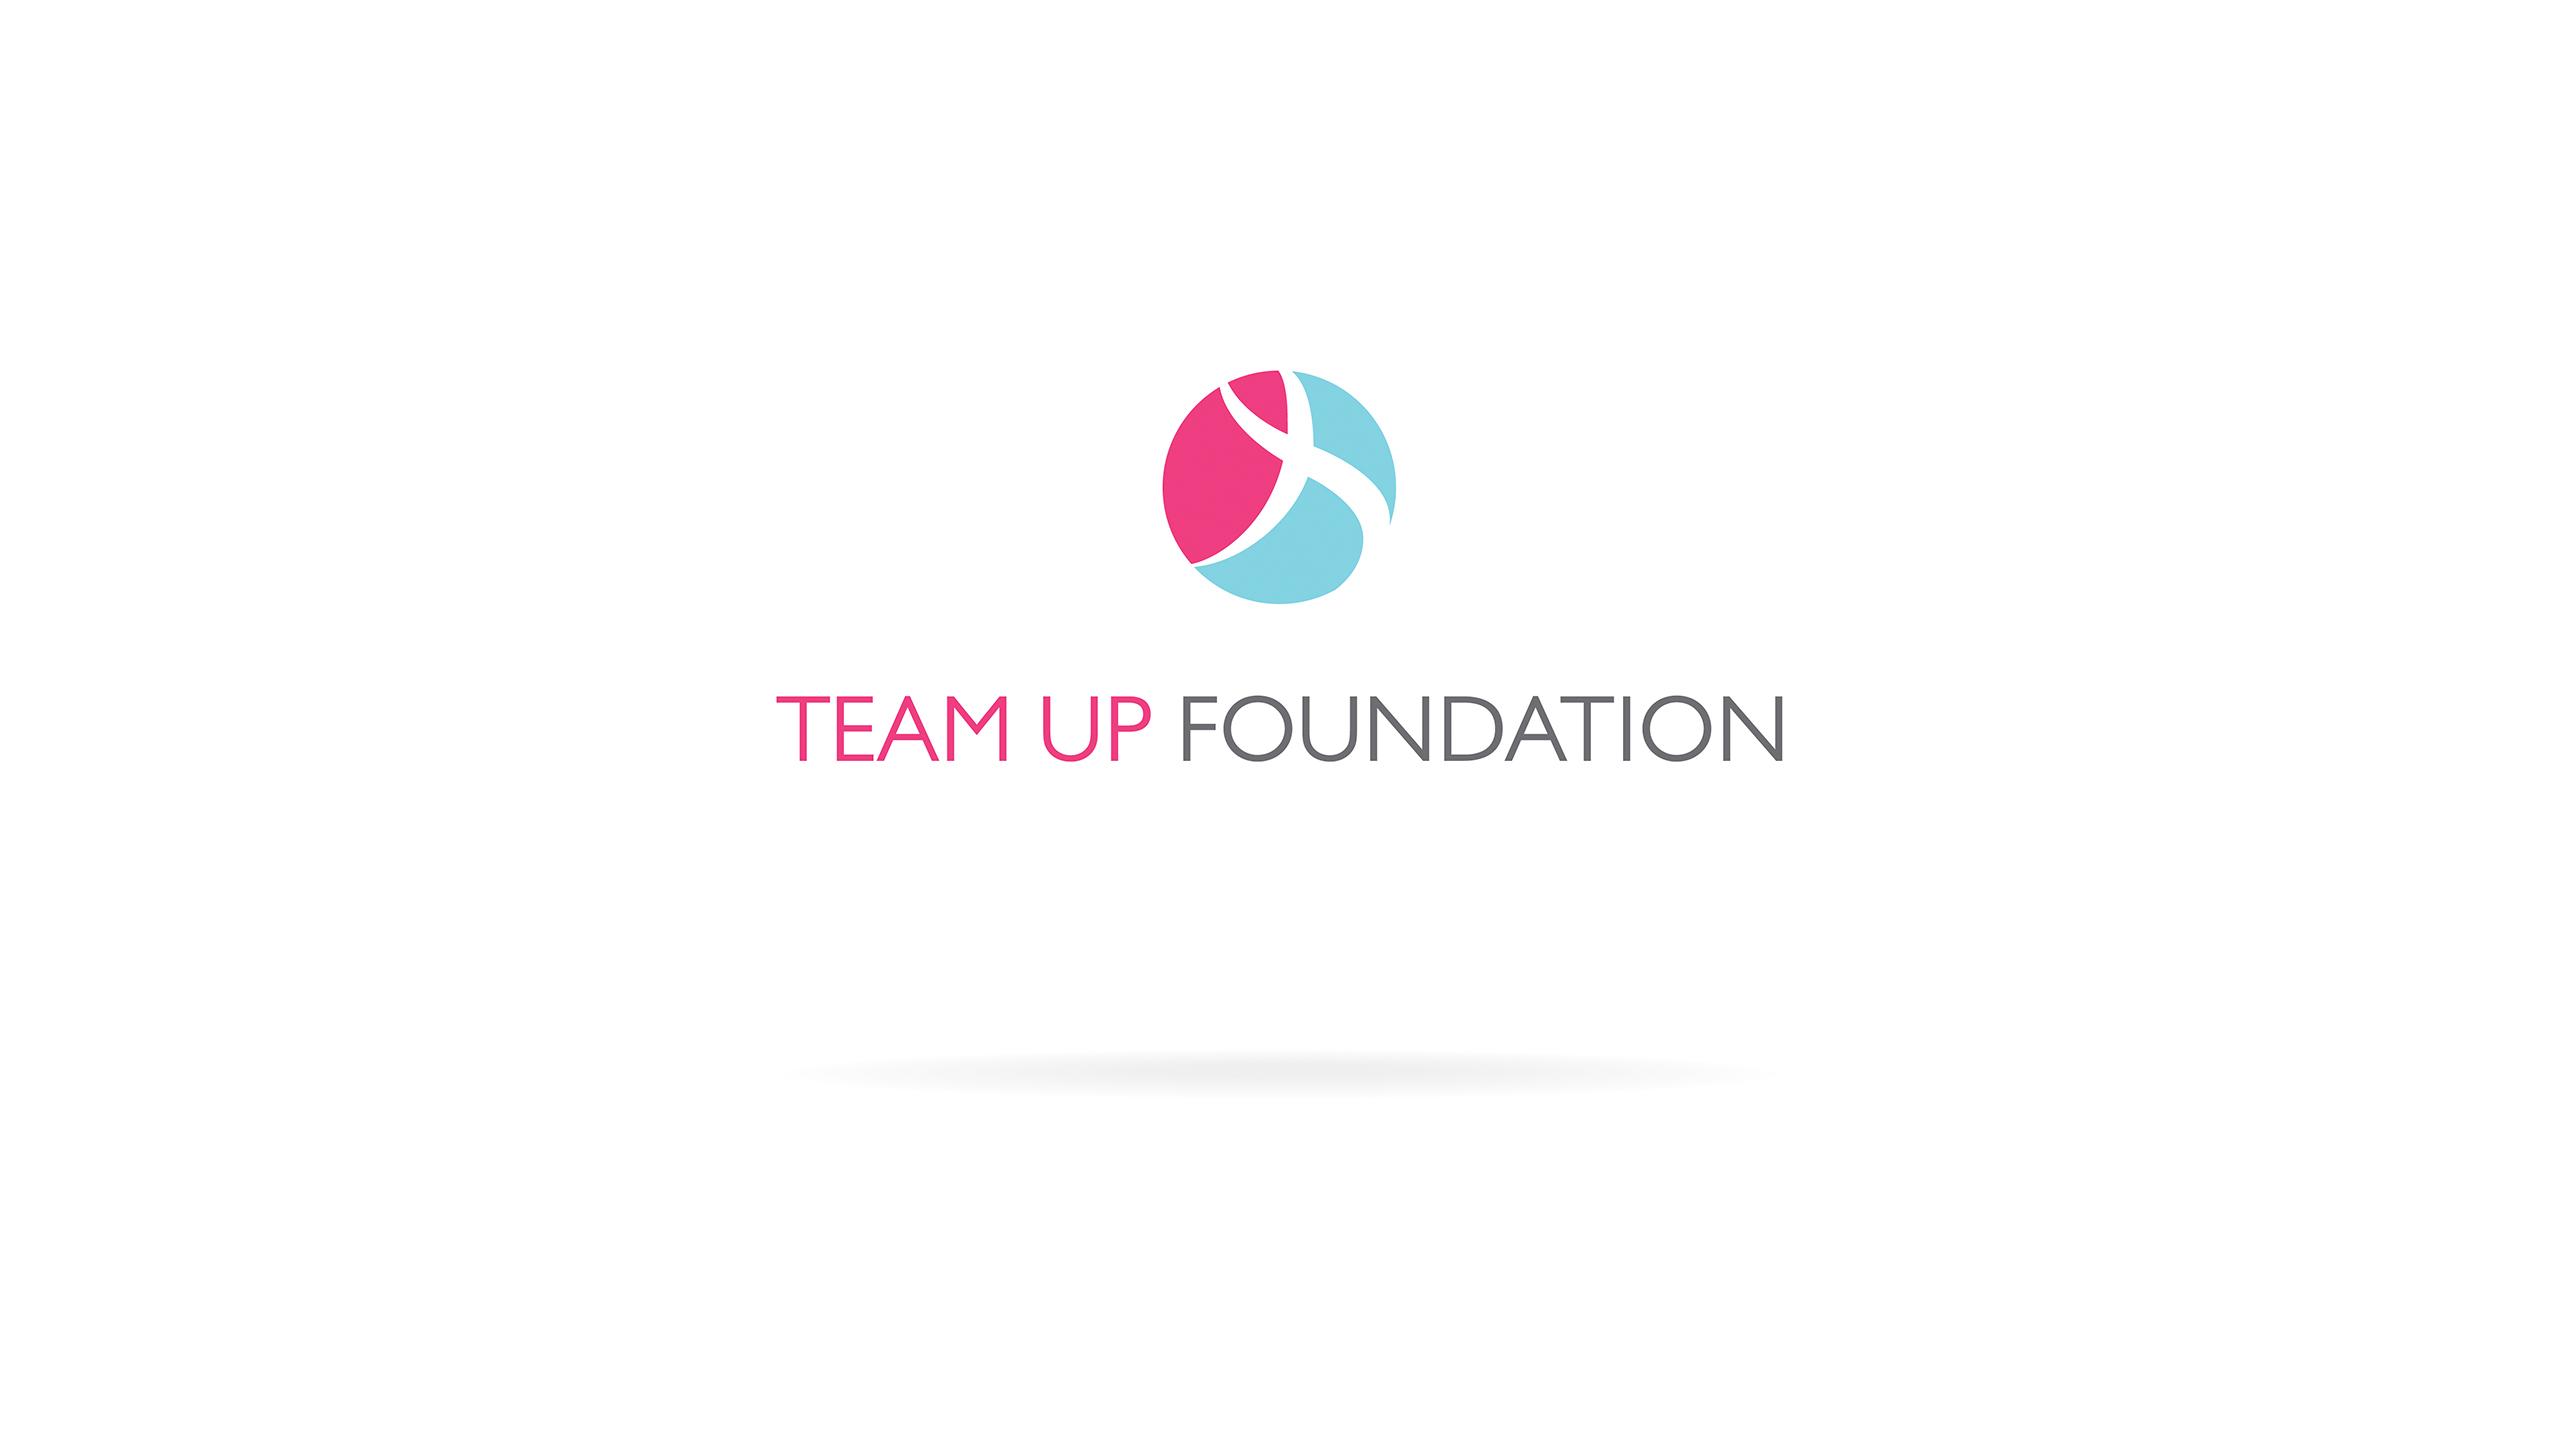 kamikaze_identidad_corporativa_diseno_grafico_team-up-foundation_10